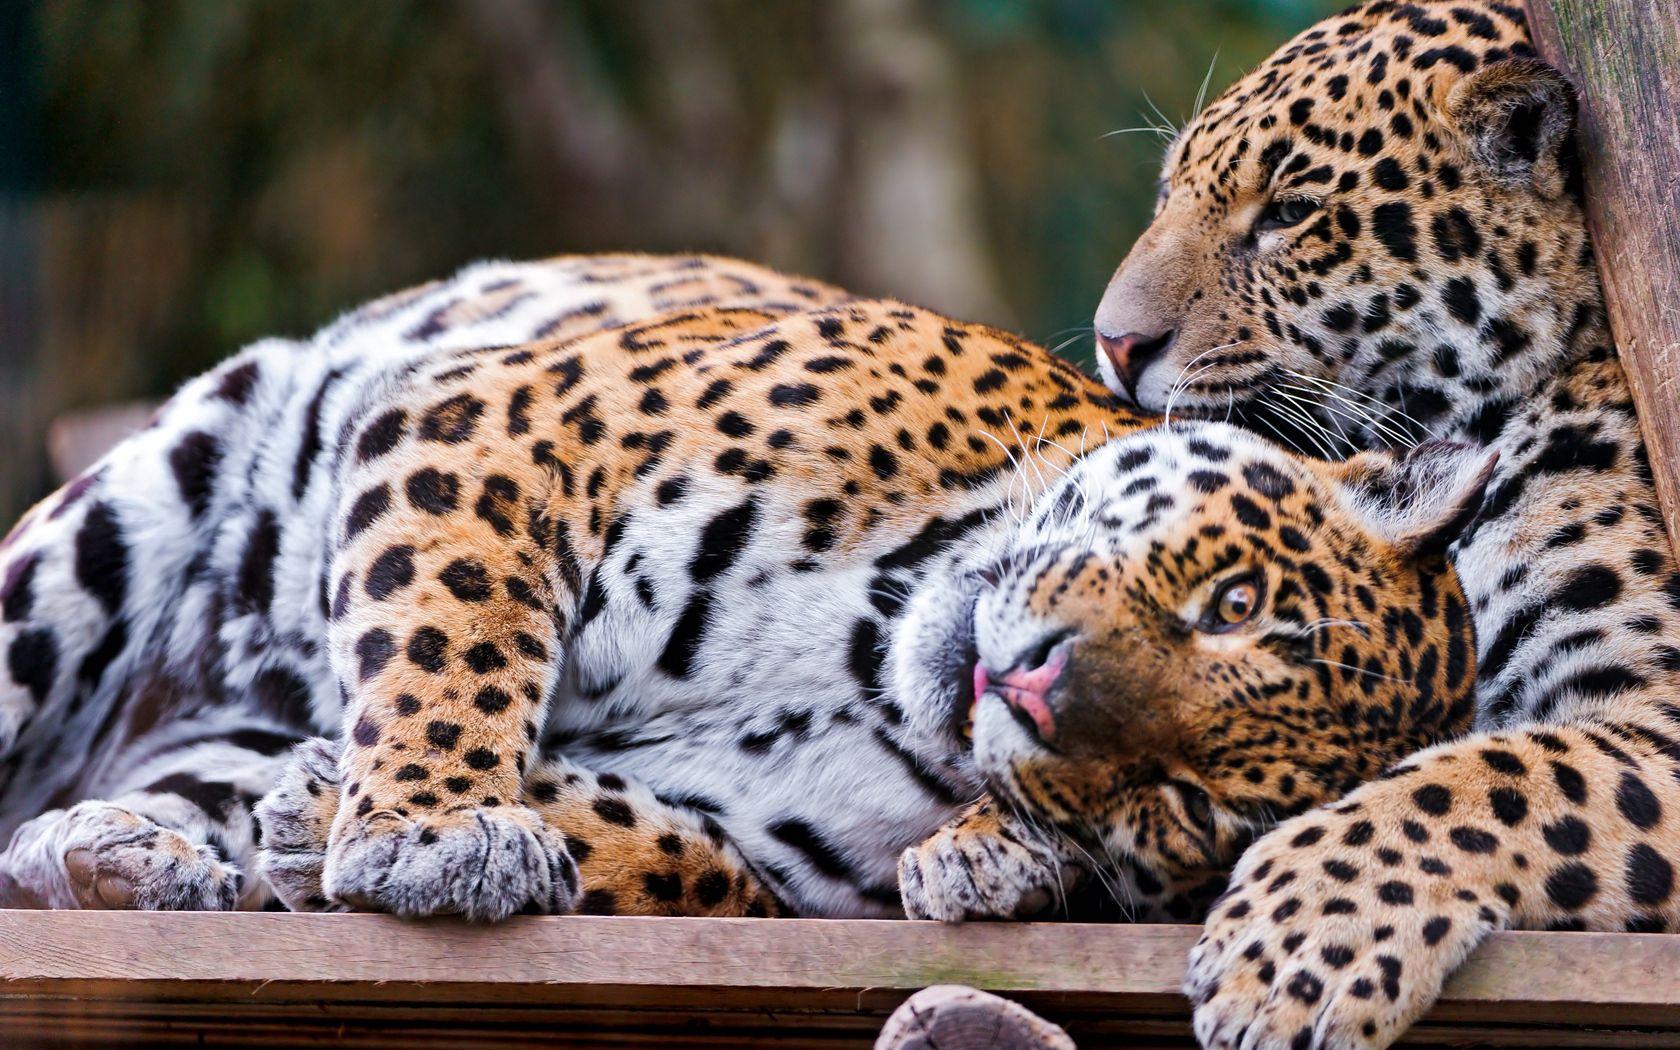 155288 download wallpaper Animals, Jaguar, Couple, Pair, Playful, Big Cat, Predator screensavers and pictures for free